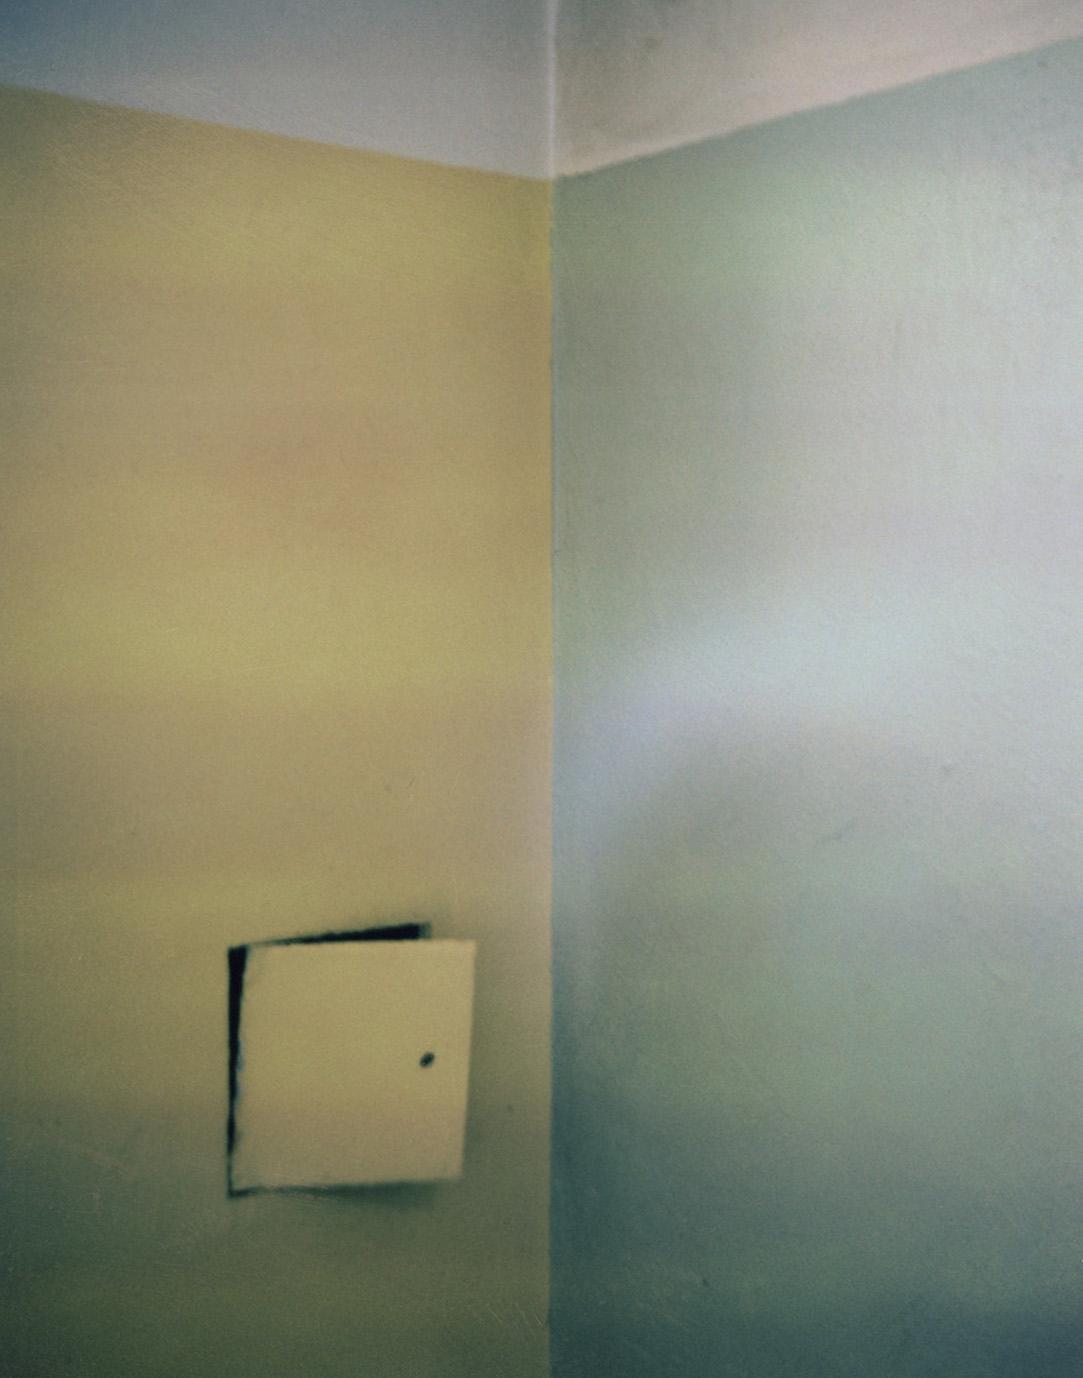 003t.jpg